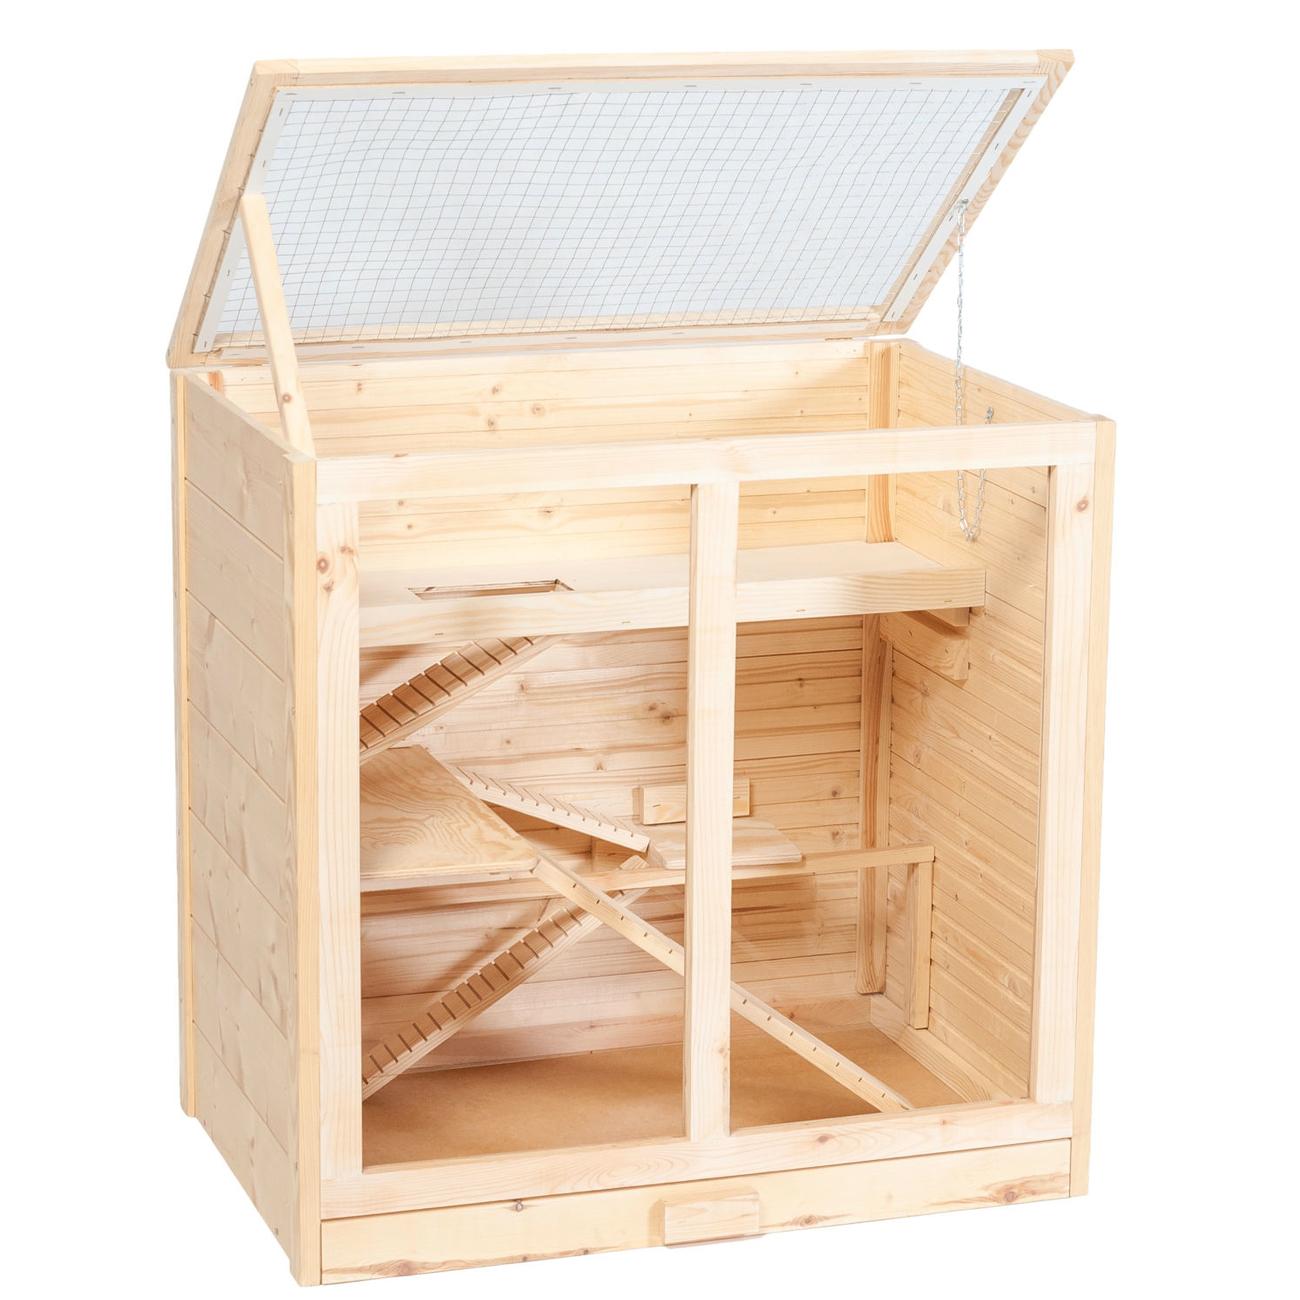 Silvio Design Holz Hamsterkäfig Arni, L53 x B80 x H80 cm, natur